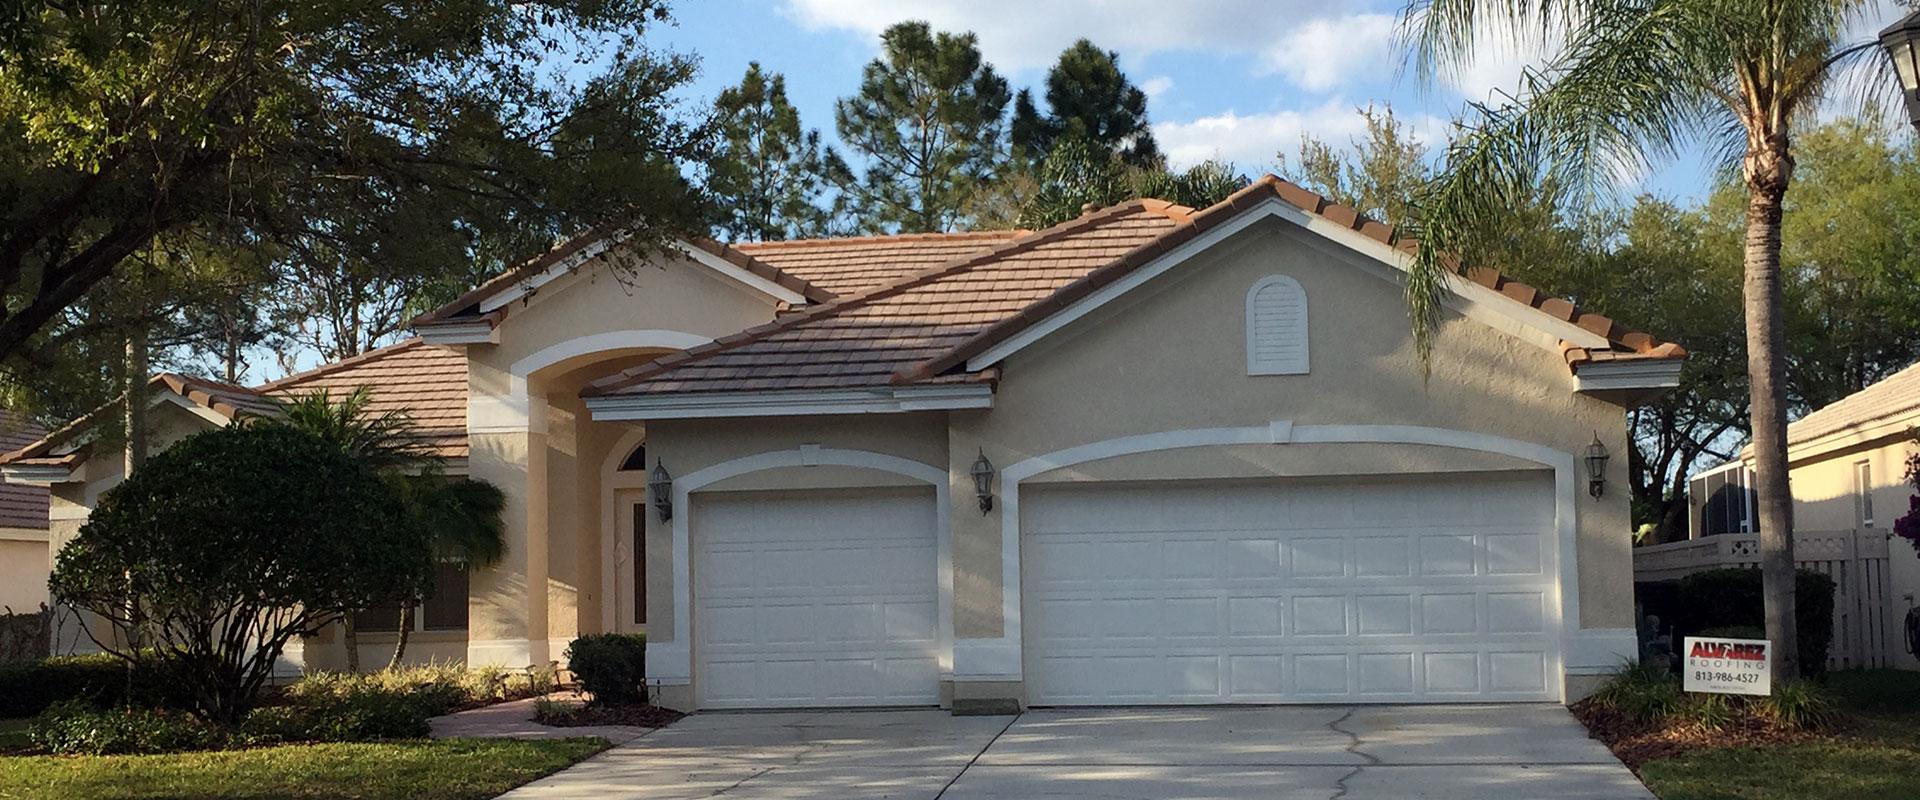 Elegant Tile Roofing Systems